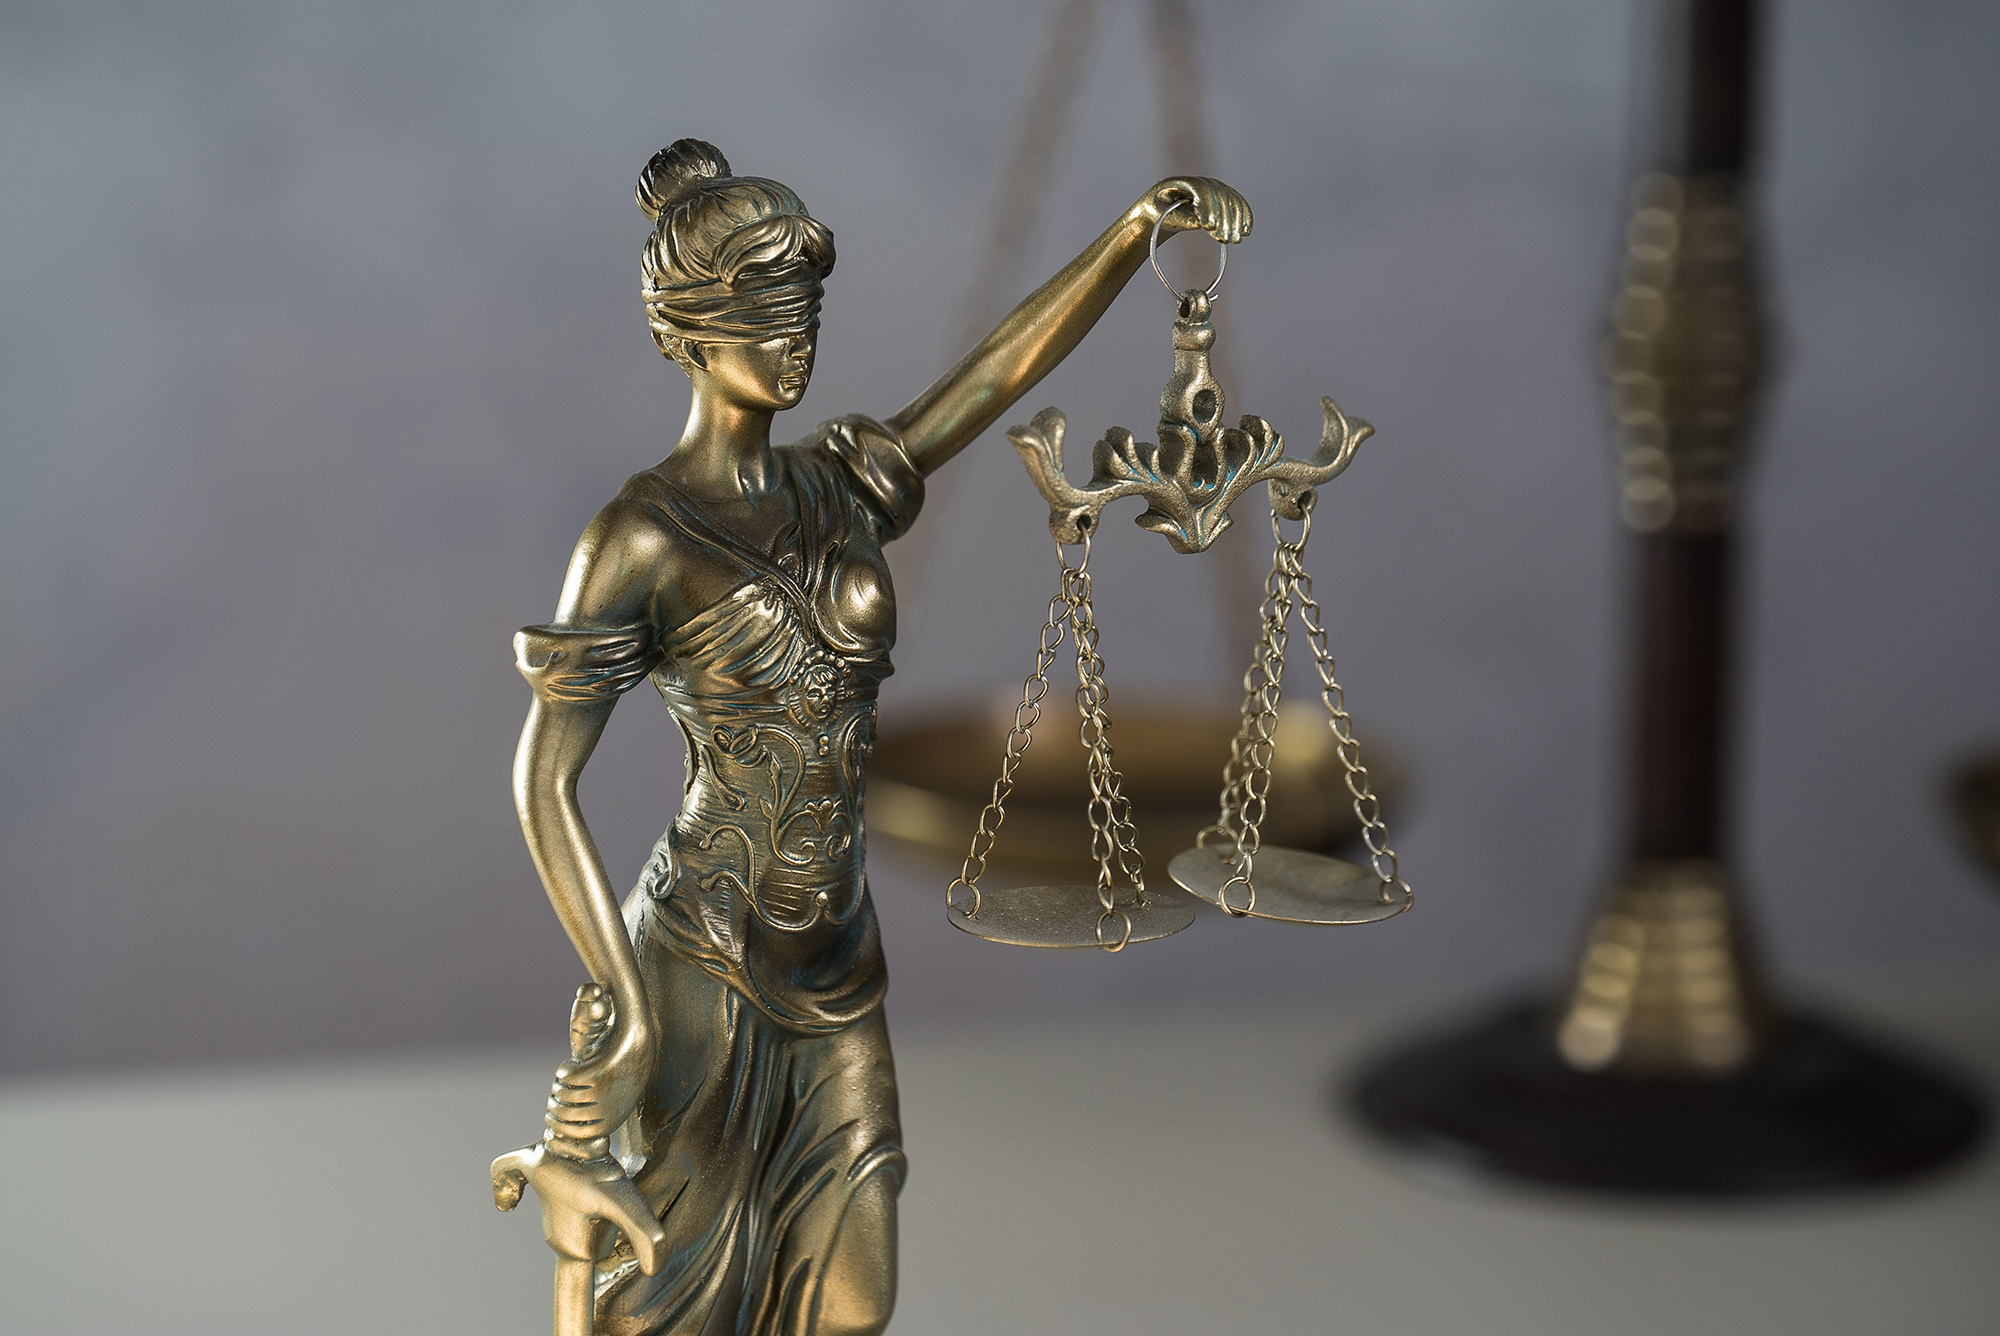 Blockade statt Aufklärung – Klage gegen Maseknzwang